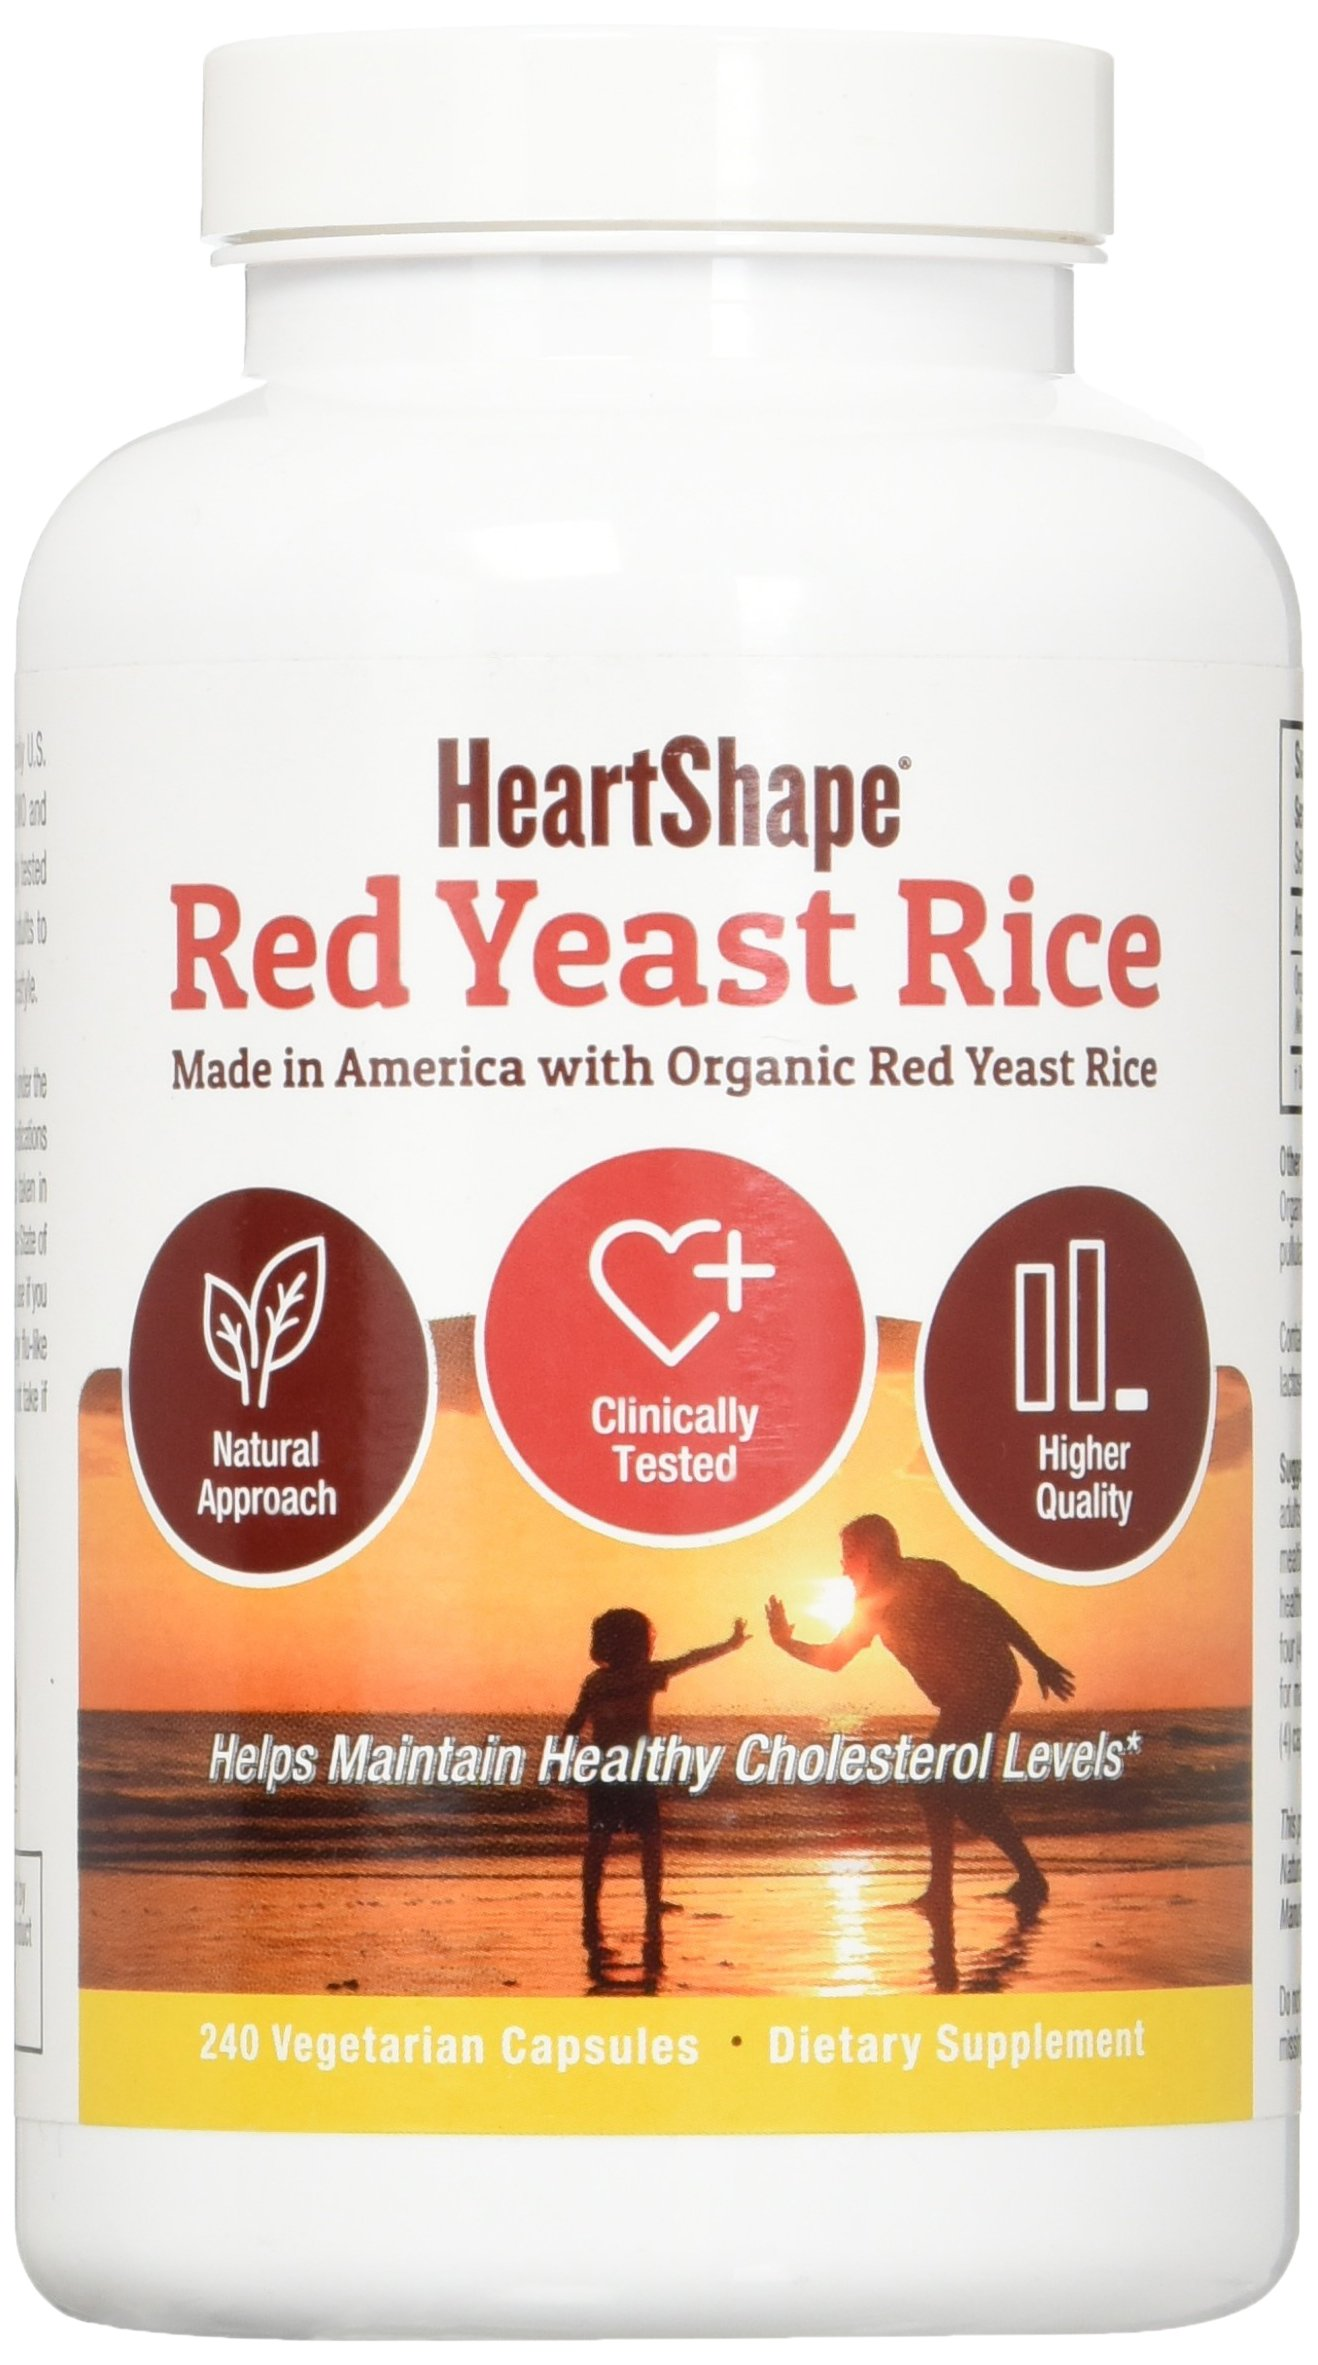 HeartShape Red Yeast Rice 240 Count